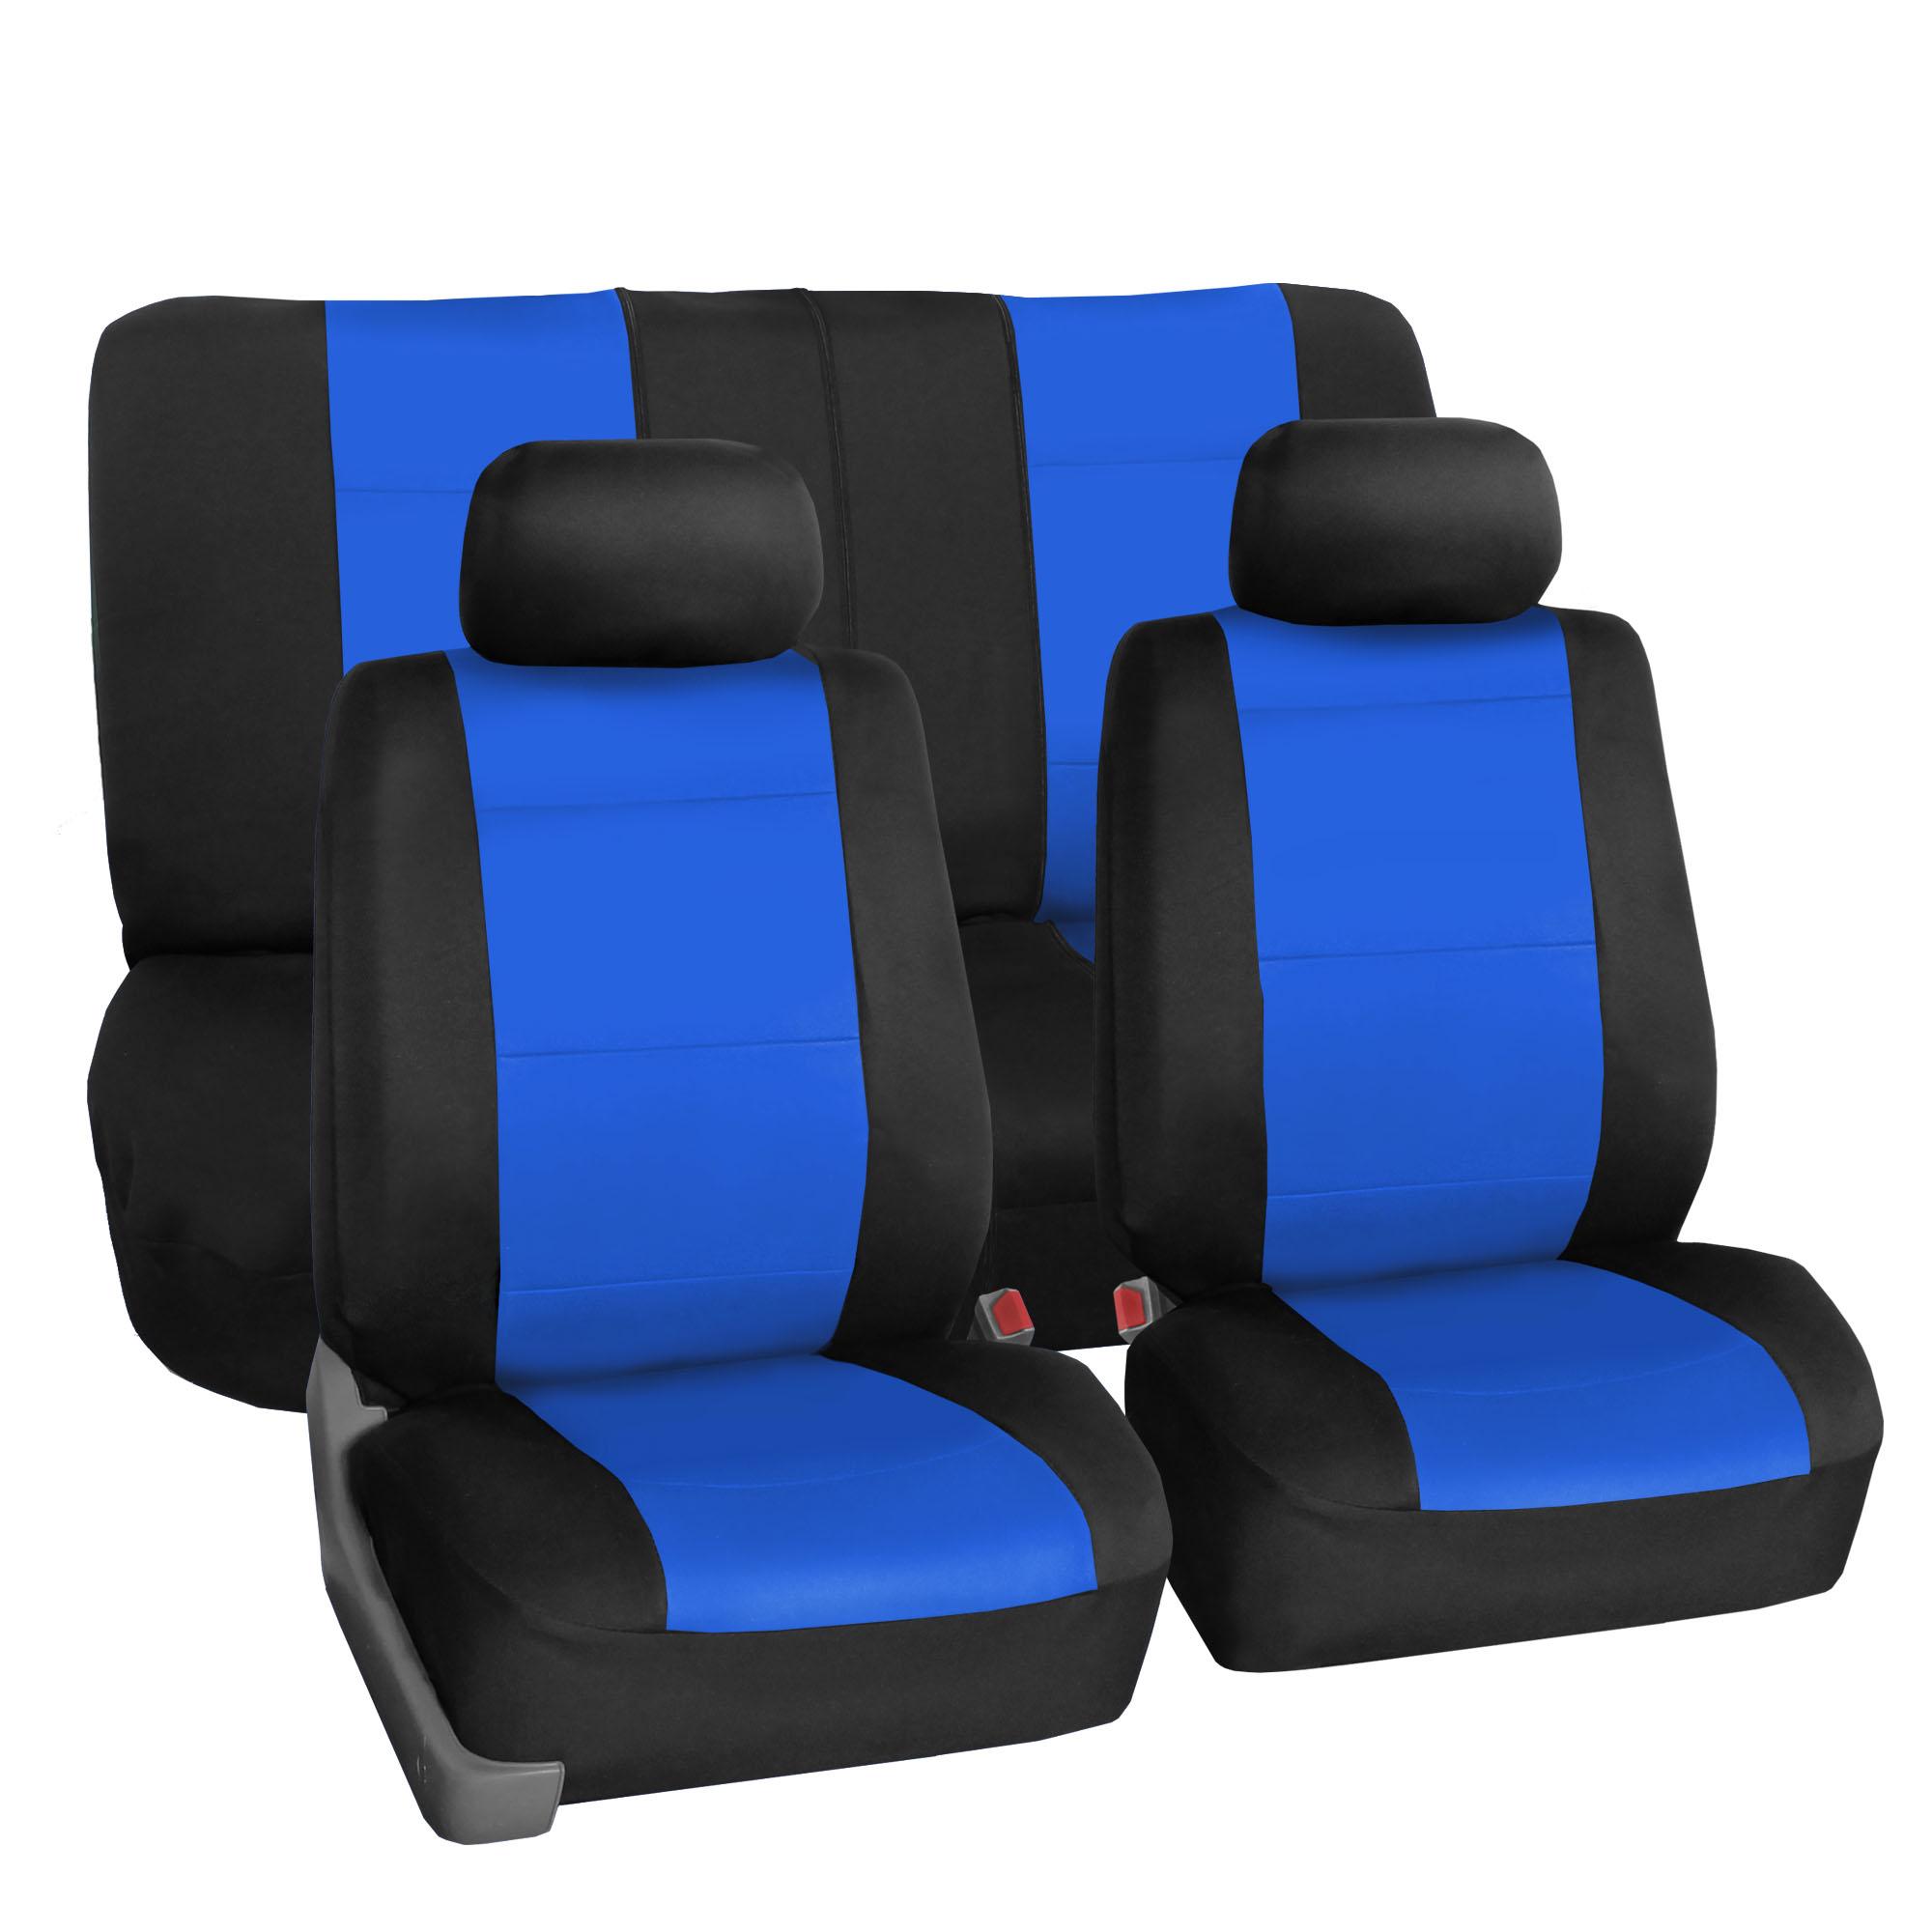 car seat cover neoprene waterproof pet proof full set 2 headrest cover blue ebay. Black Bedroom Furniture Sets. Home Design Ideas